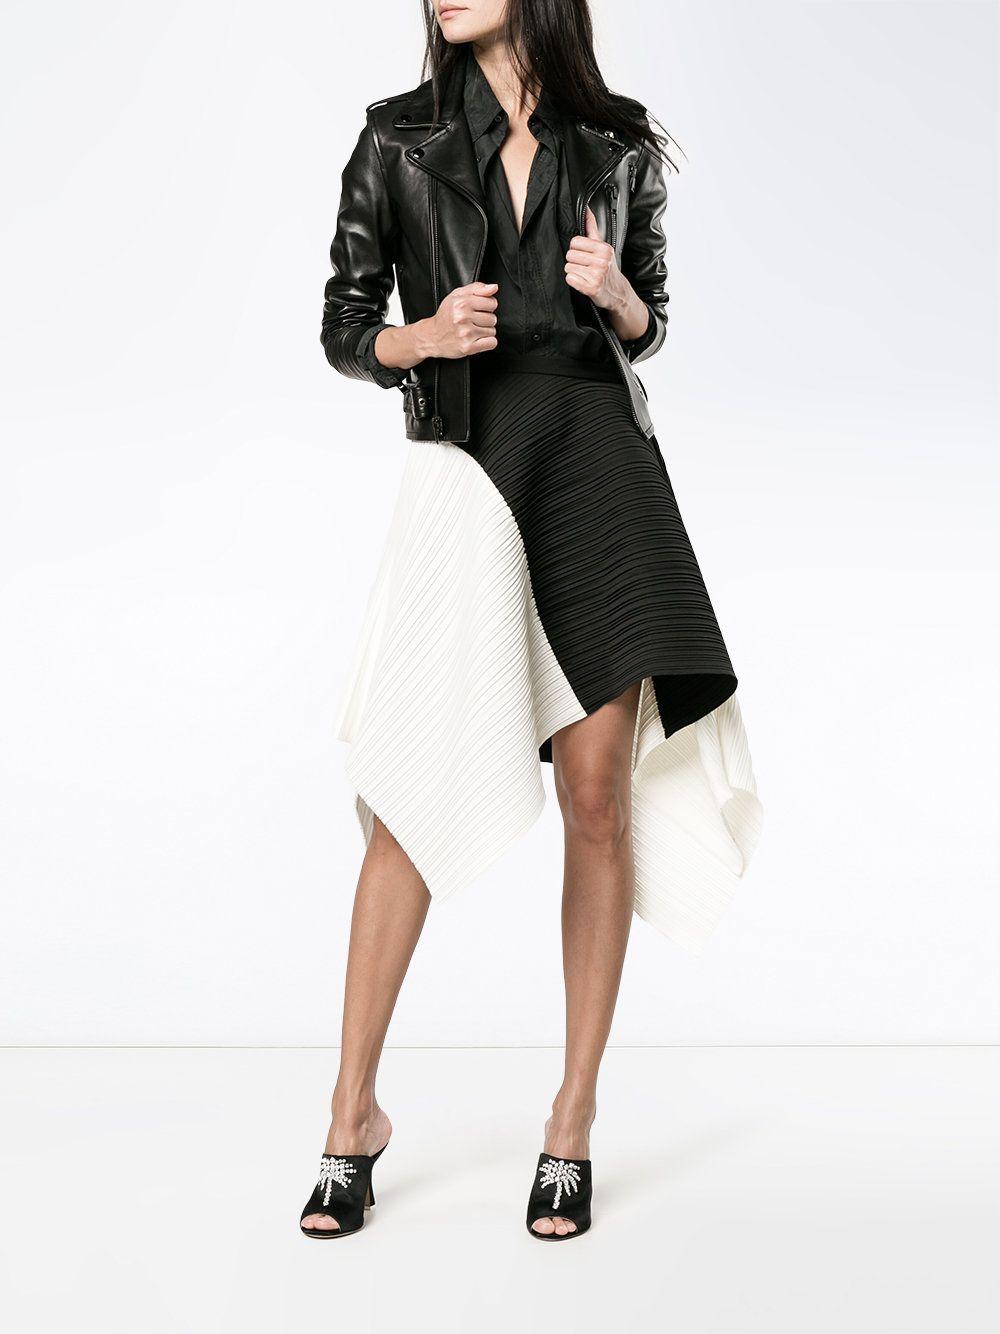 https://www.farfetch.com/lu/shopping/women/proenza-schouler-asymmetric-pleated-skirt-item-12080274.aspx?storeid=9359